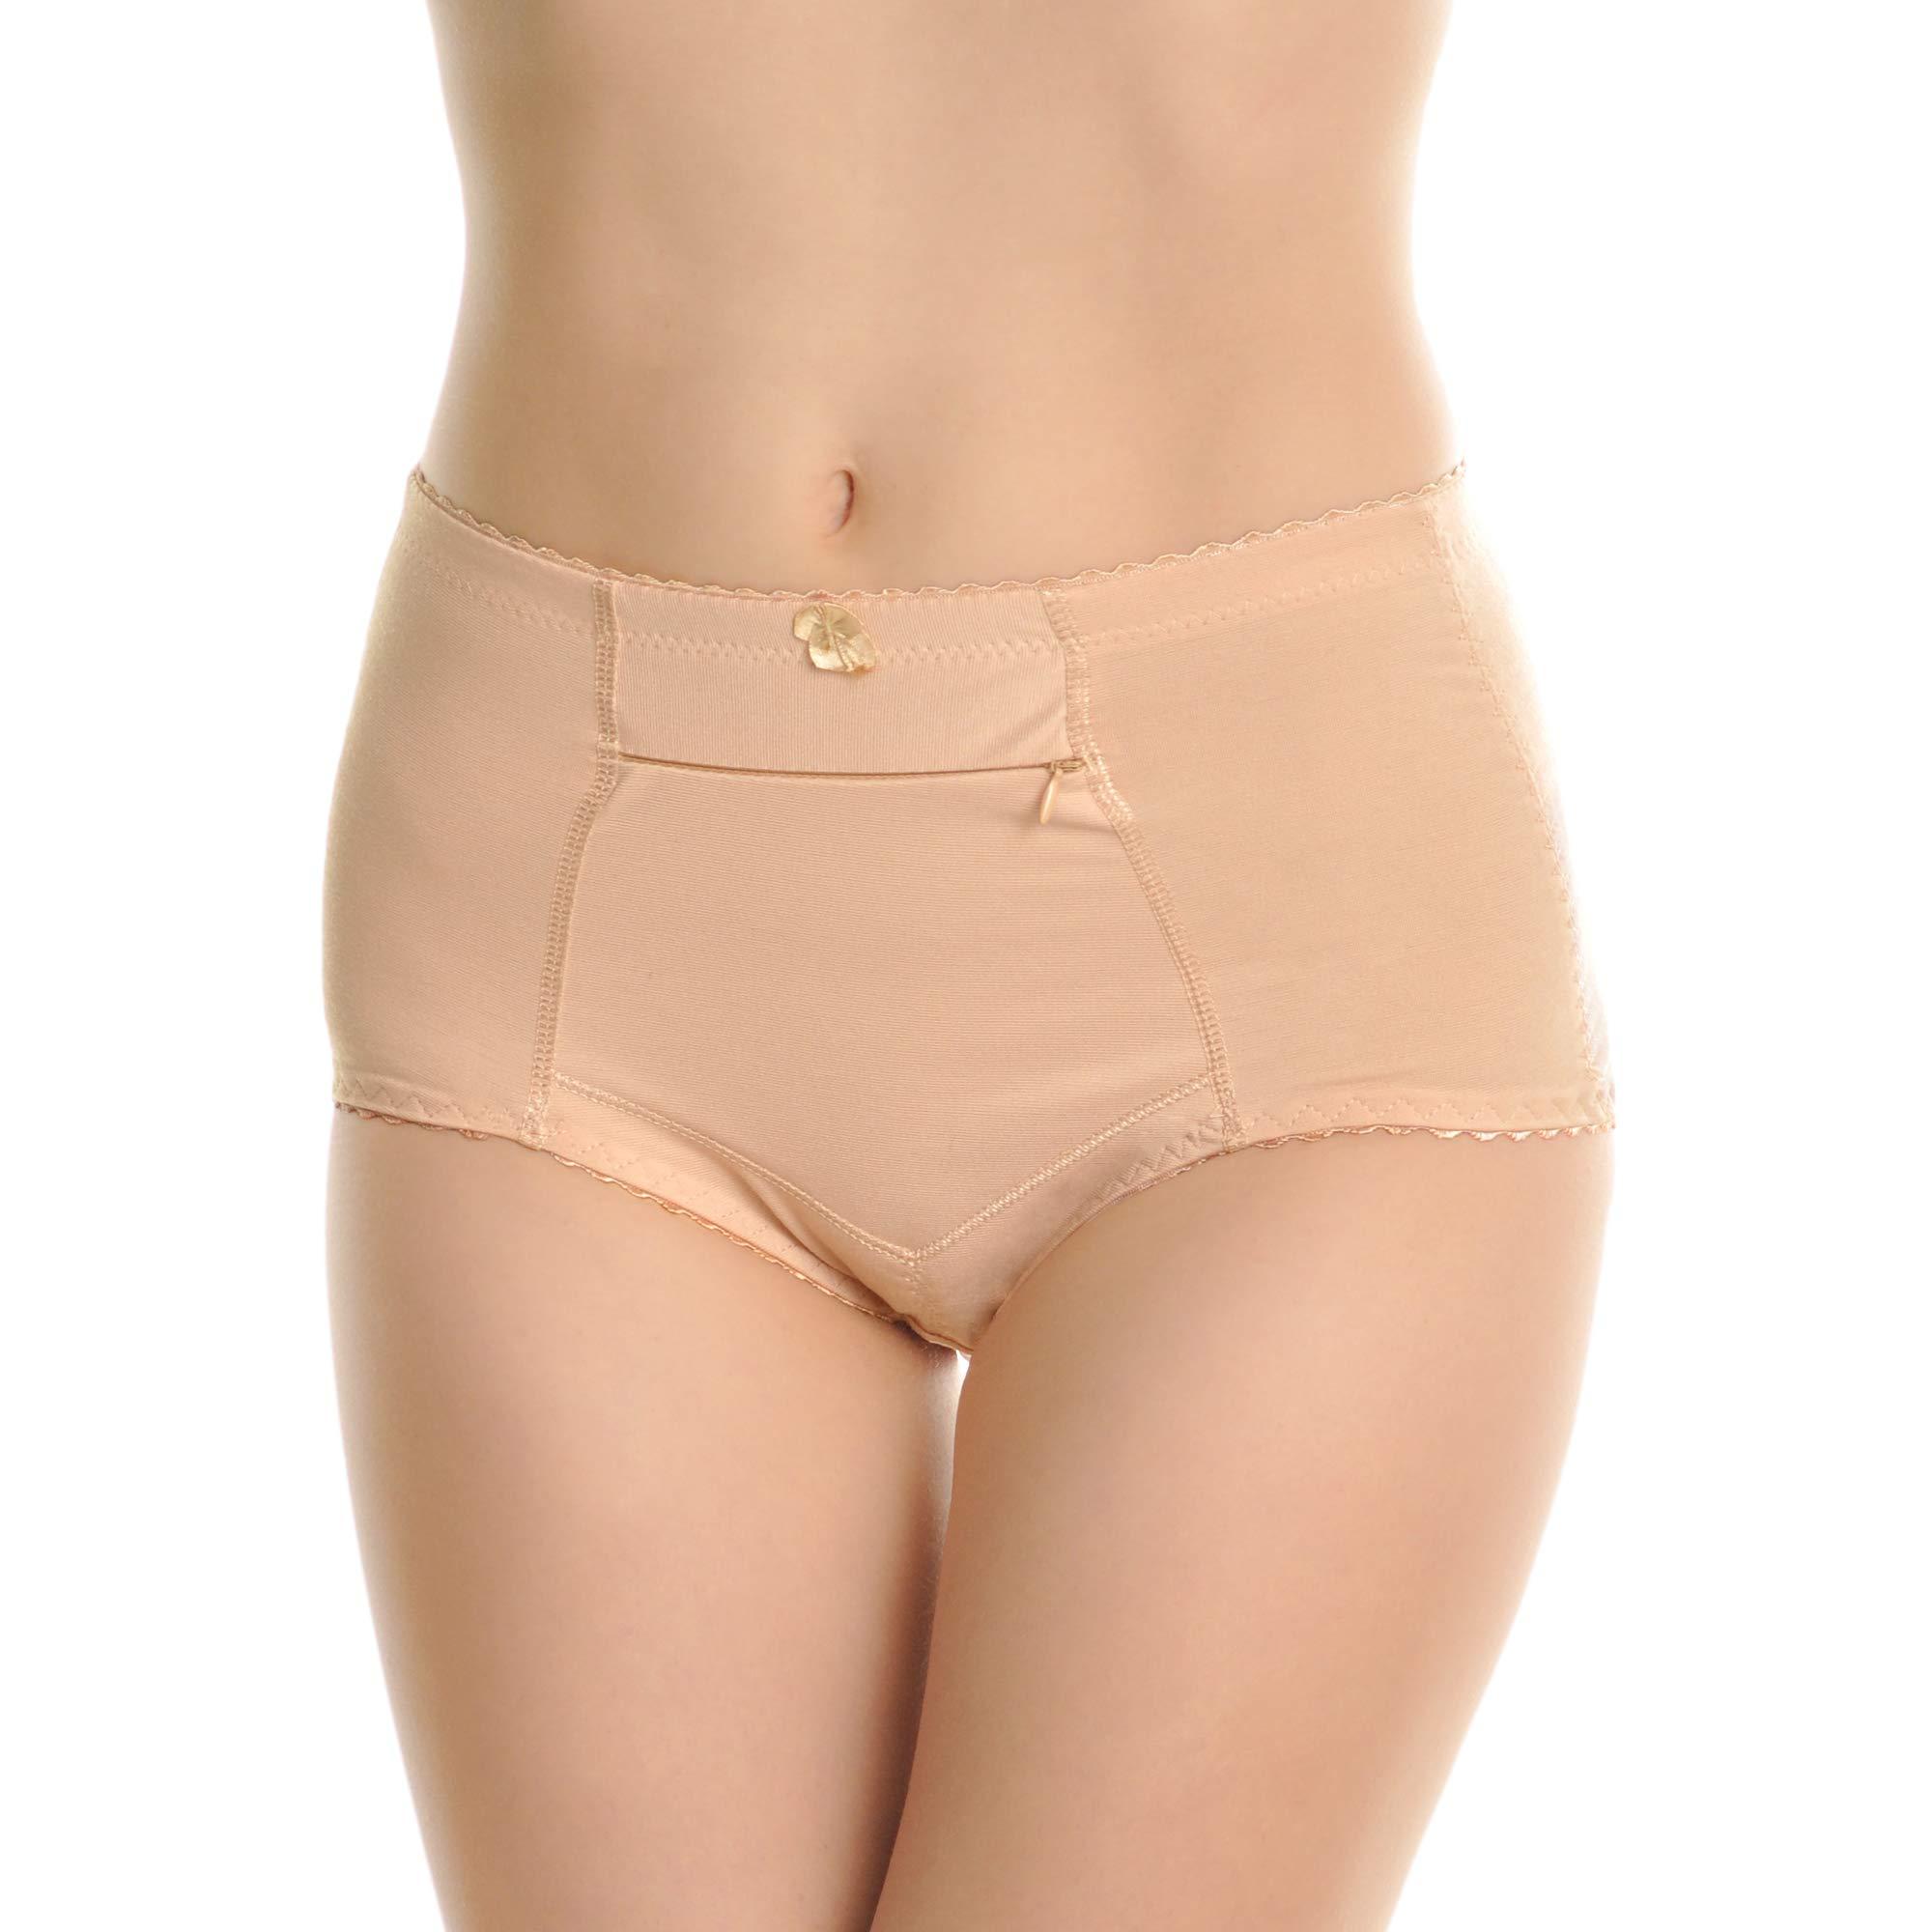 Angelina Women's High Waisted Zippered Pocket Girdle